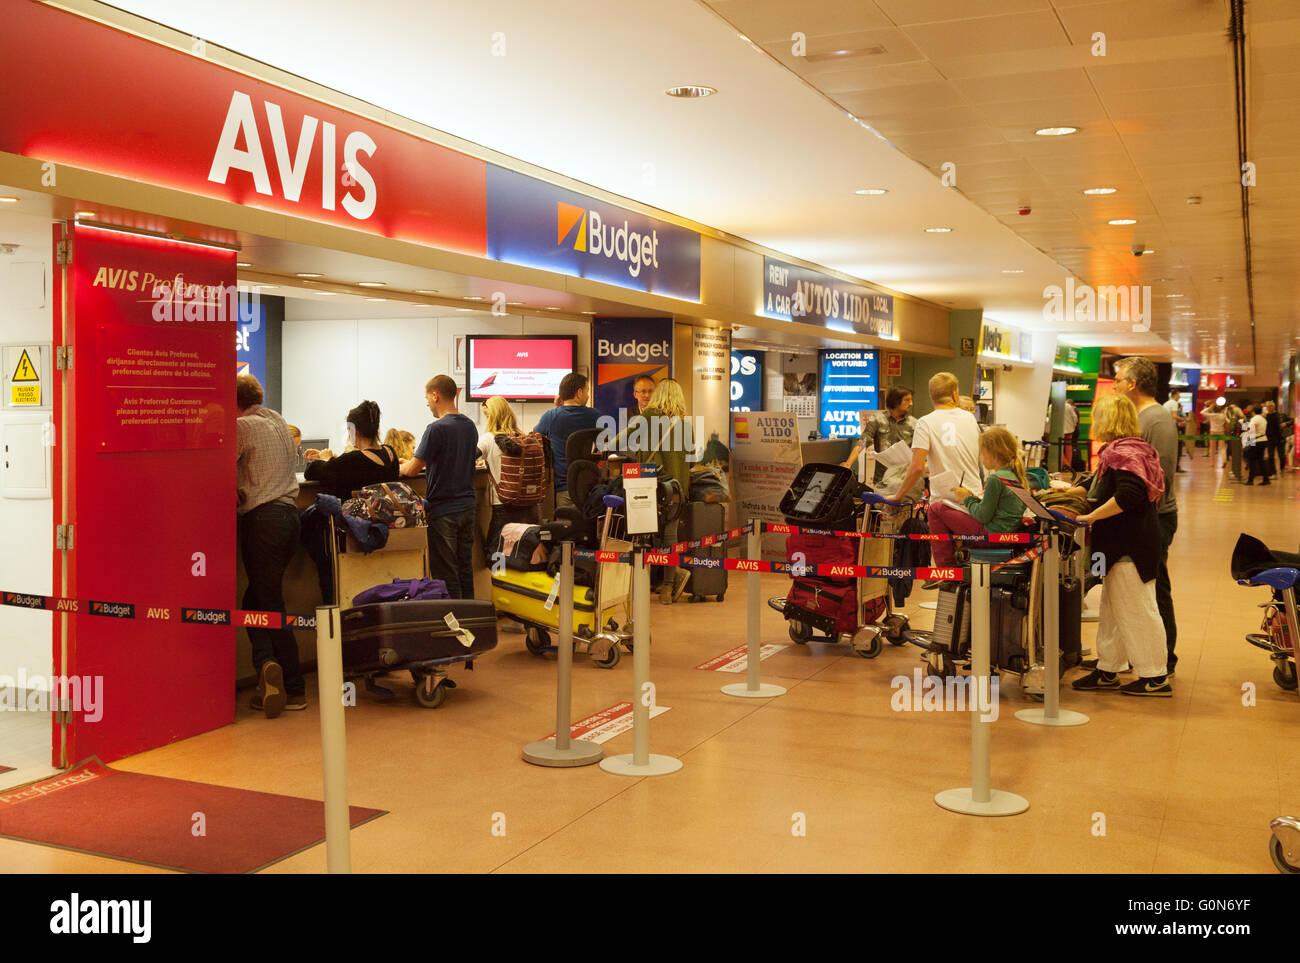 Holiday makers queue at car rental desks, Malaga airport, Costa del Sol, Spain, Europe Stock Photo